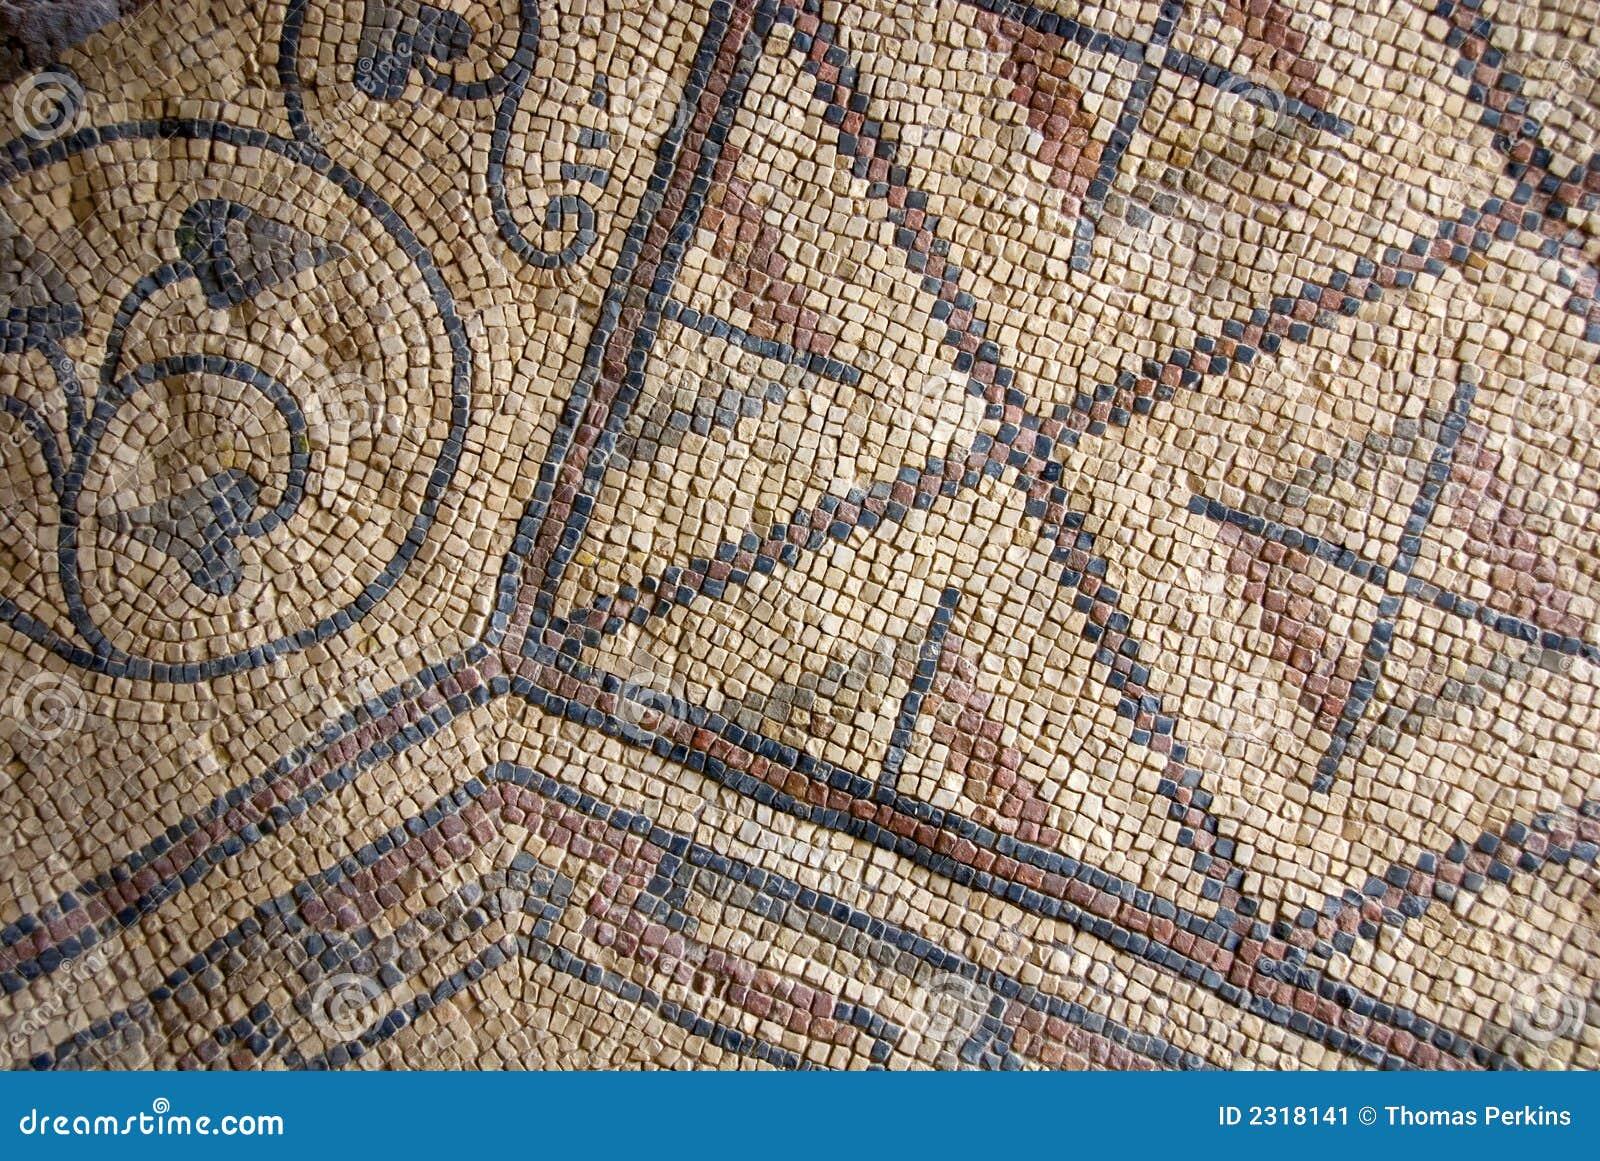 Stare mozaiki